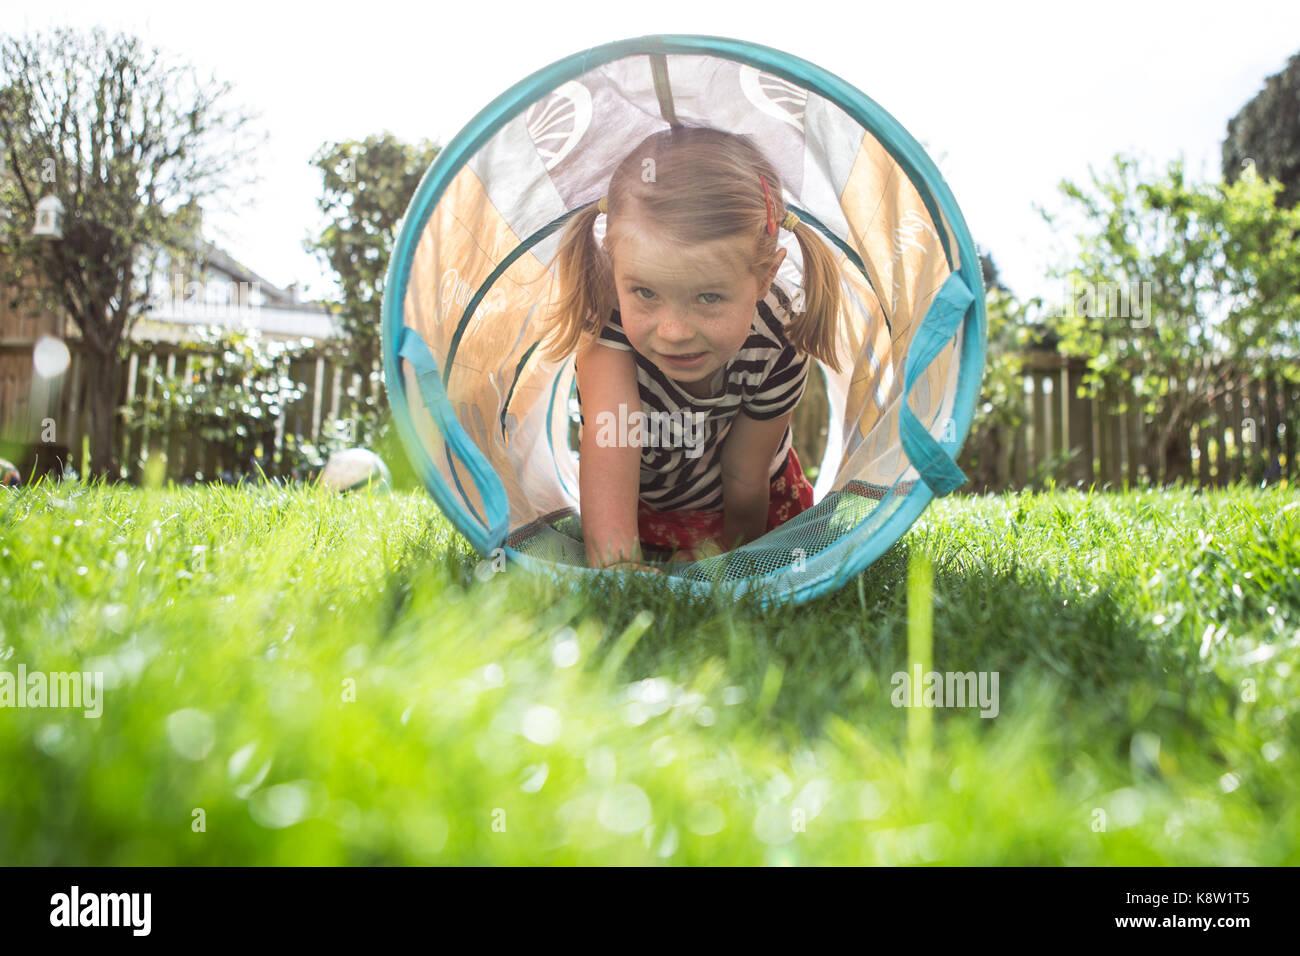 Bambina giocare in giardino Immagini Stock